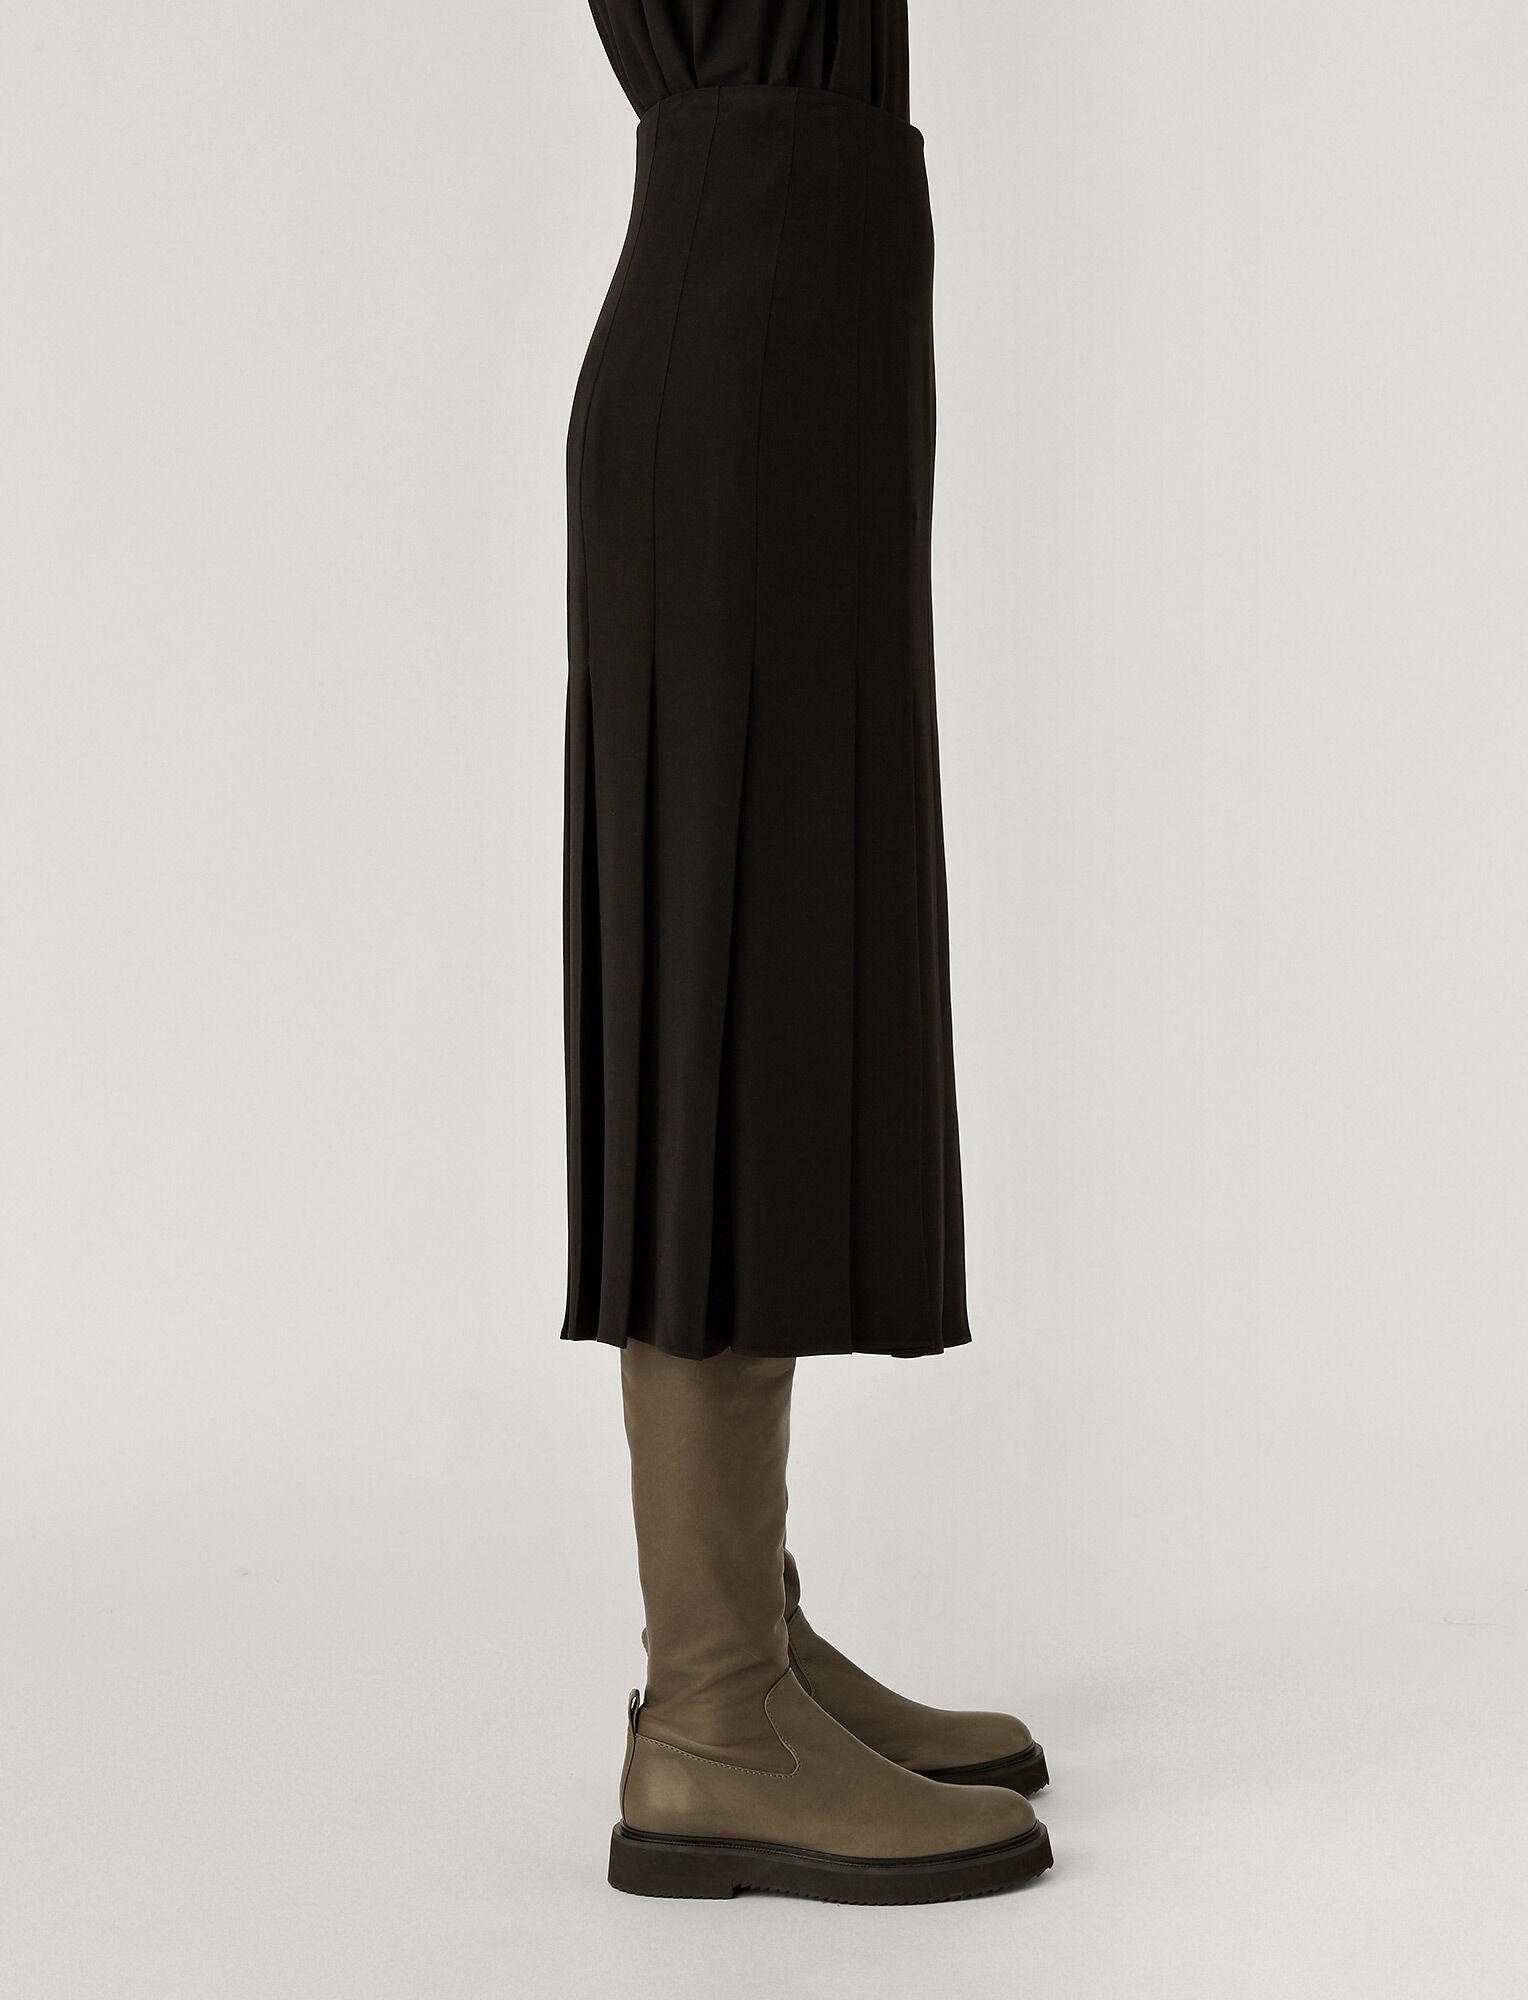 Joseph, Saria Heavy Silk Skirt, in Black